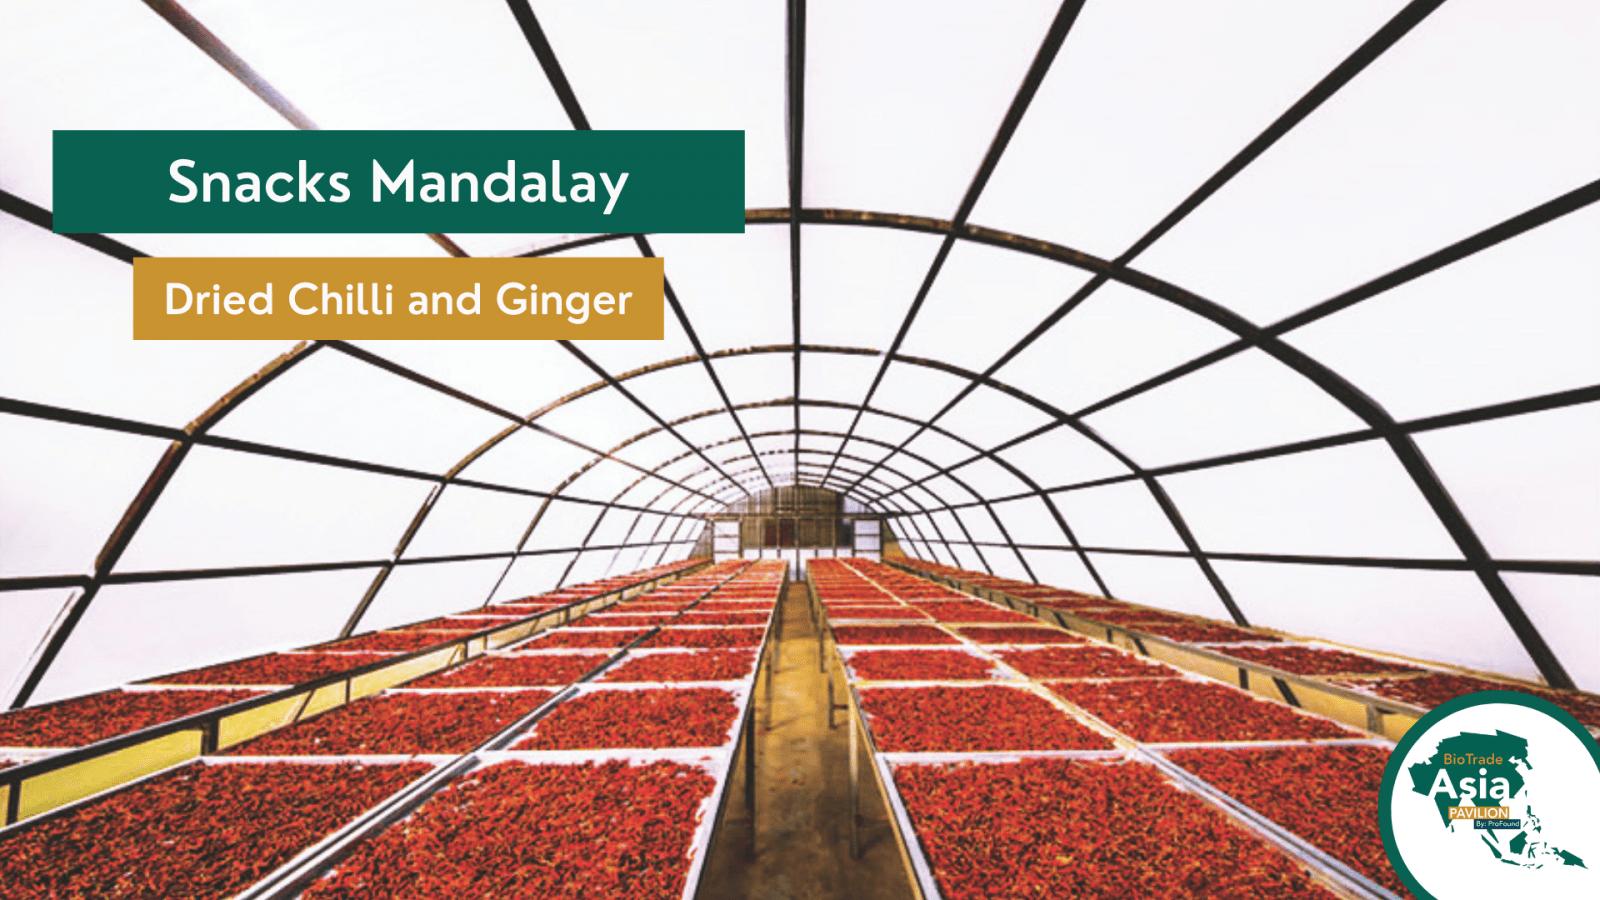 Snacks Mandalay Chilli